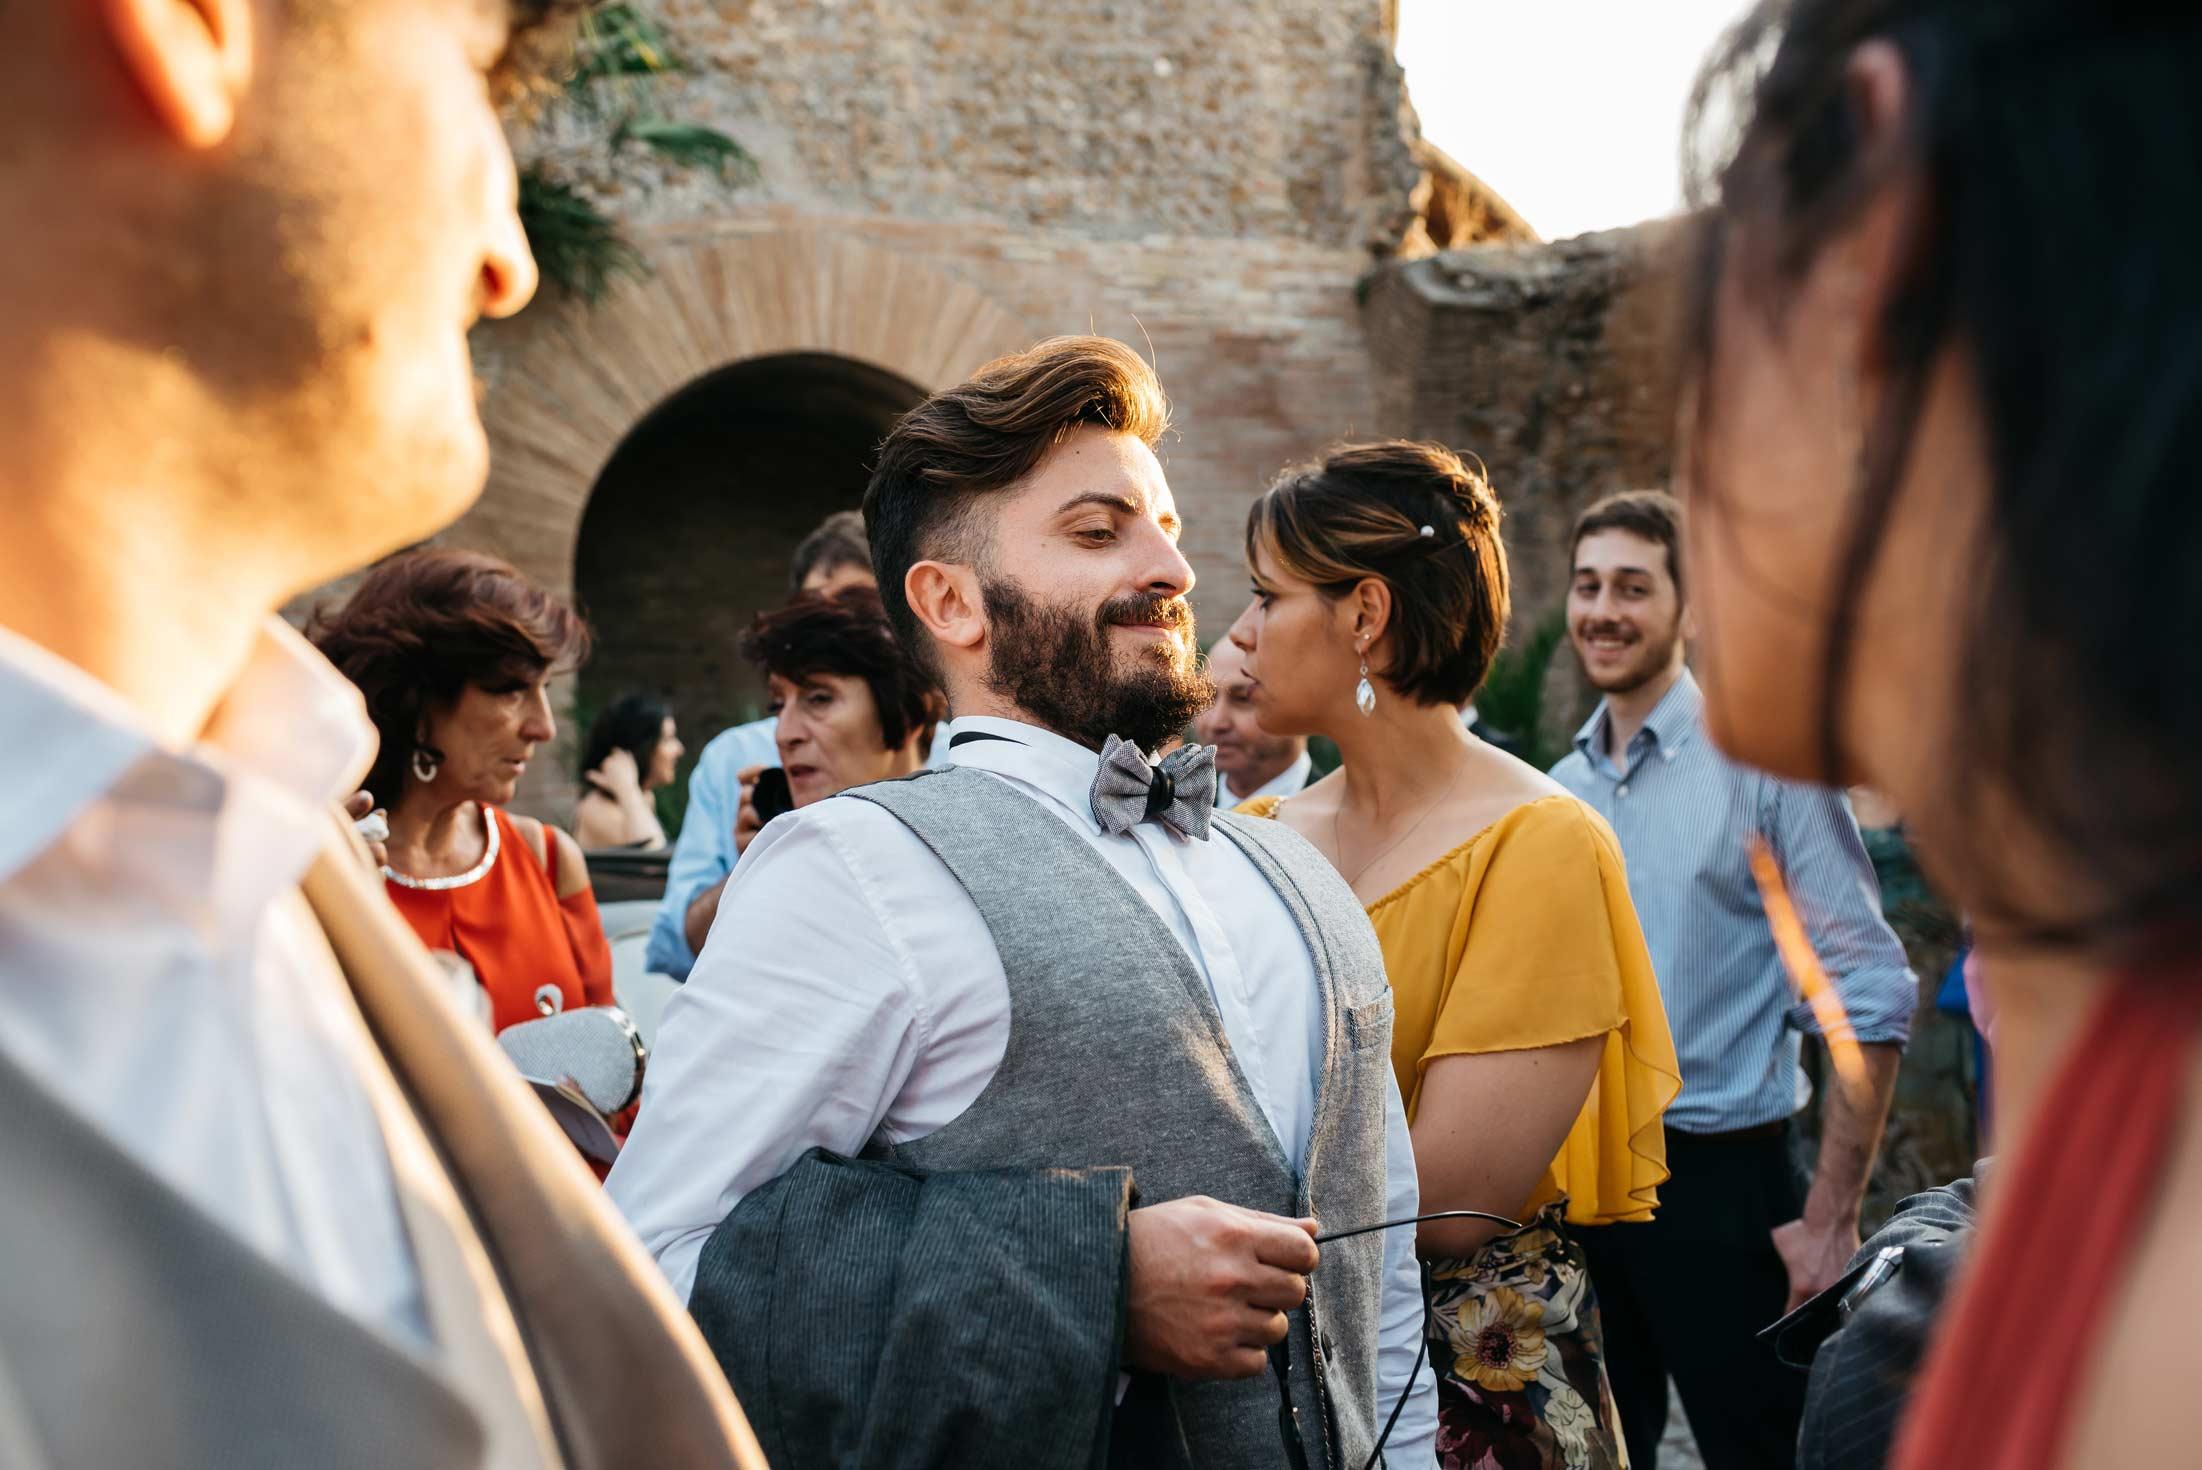 Destination-Wedding-Italy-Reportage-Photographer-2-Ceremony